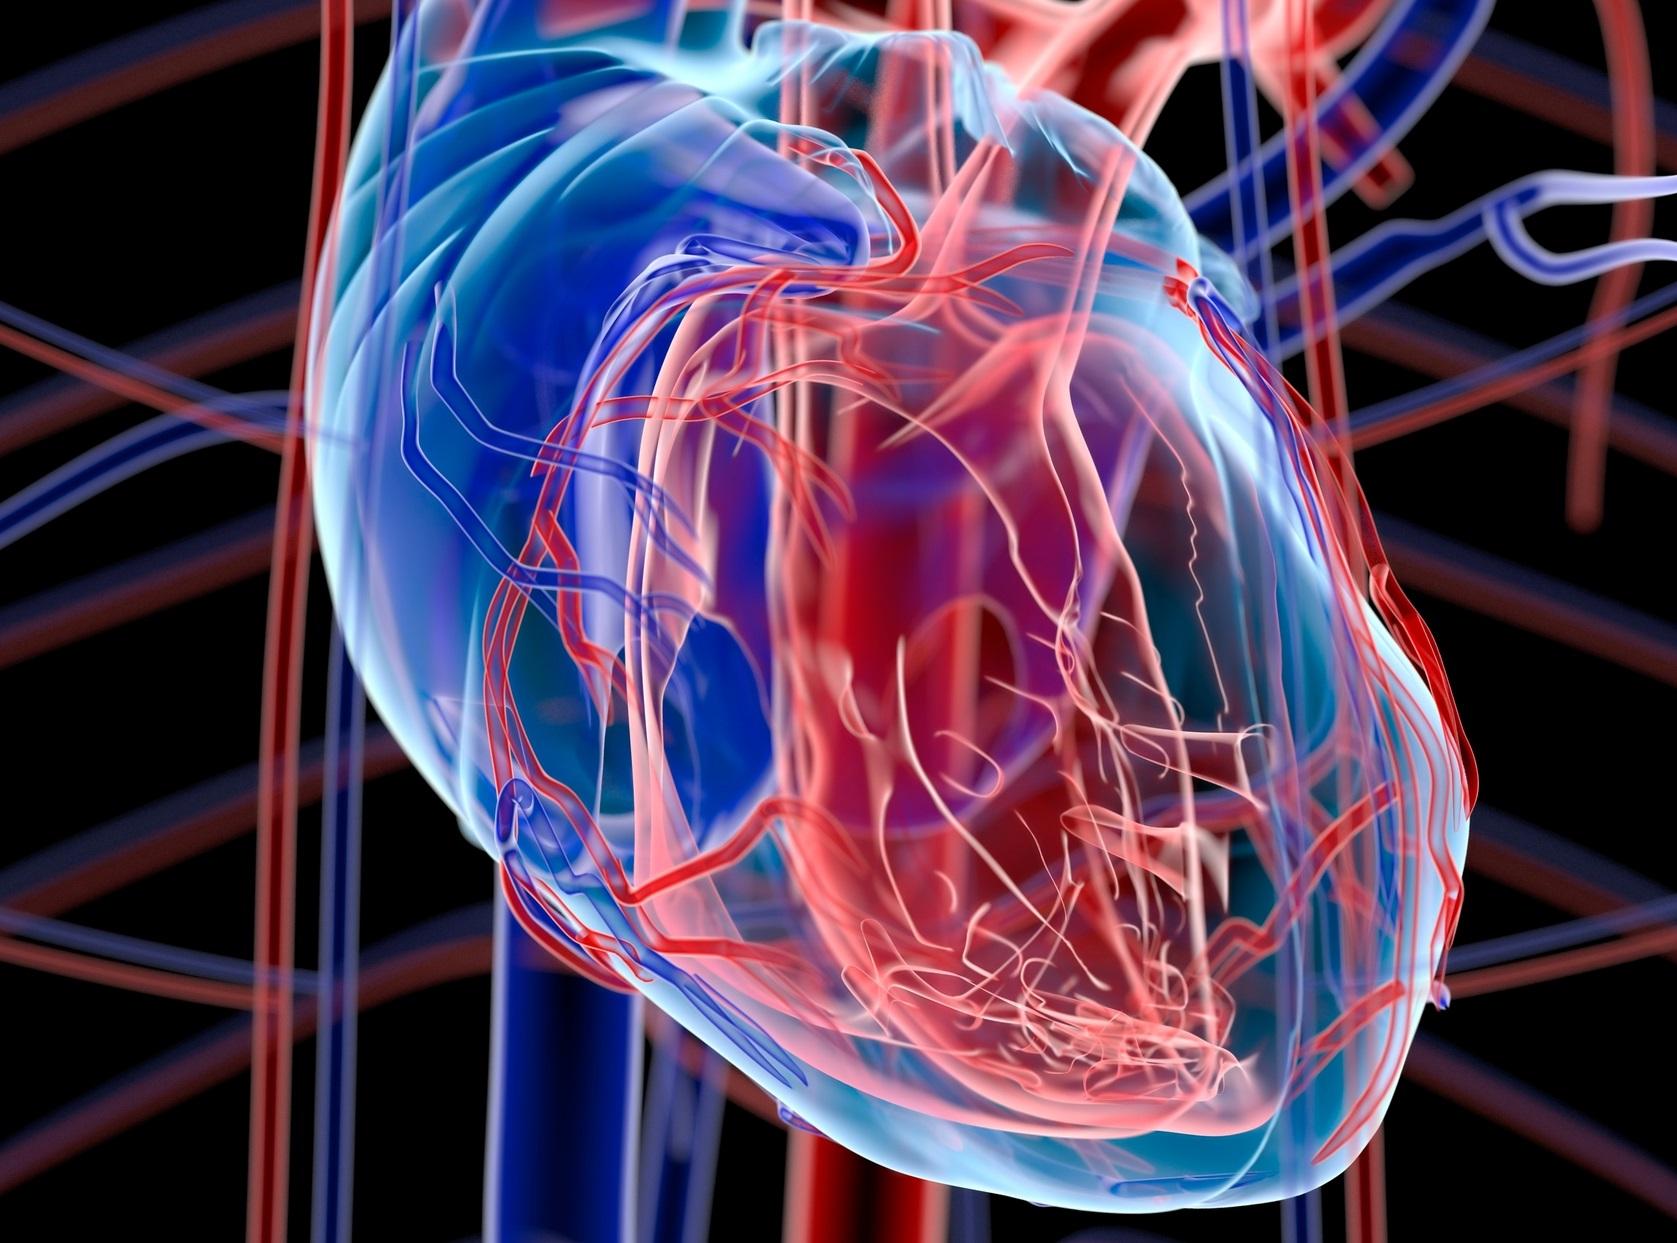 Bayer: Νέες Οδηγίες για θεραπεία ασθενών με χρόνια καρδιακή ανεπάρκεια